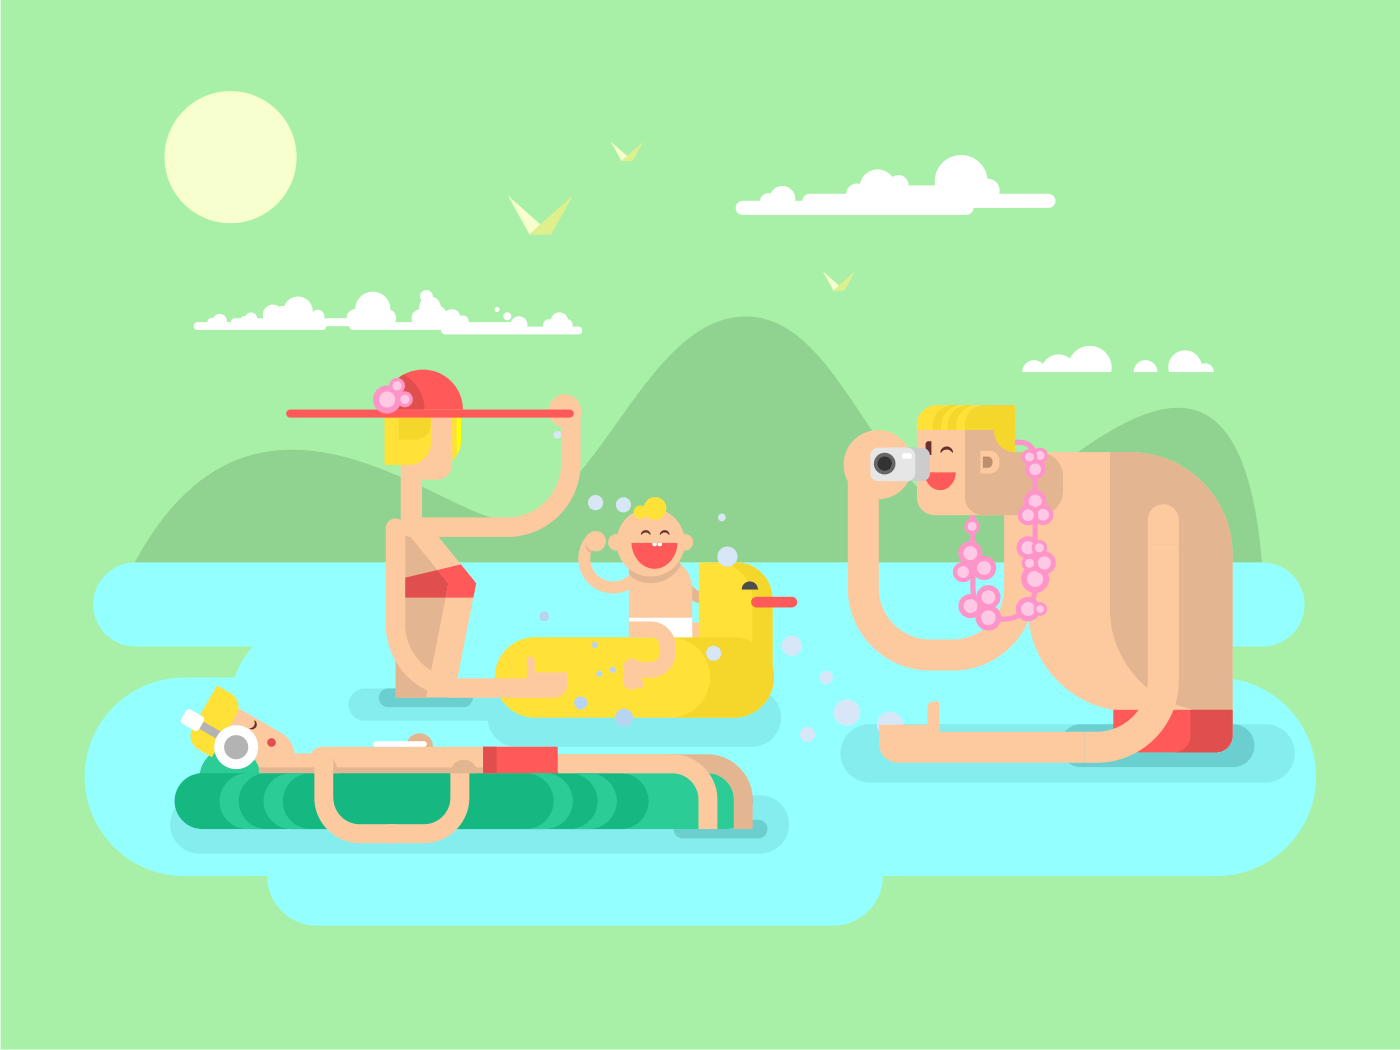 Family on vocation flat vector illustration